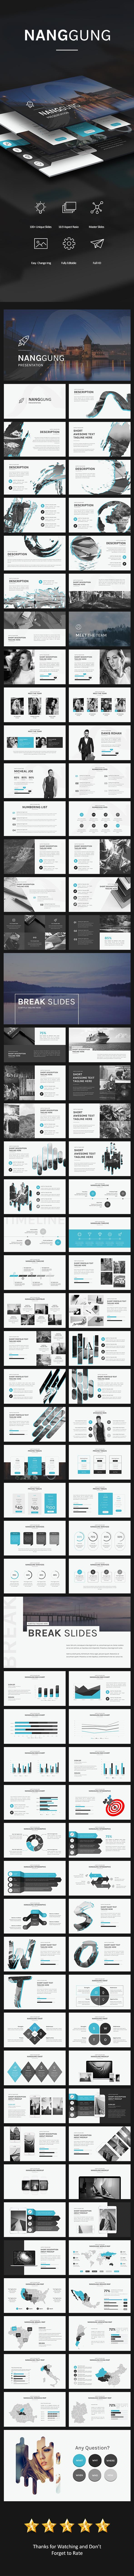 Nanggung Google Slides - Google Slides Presentation Templates